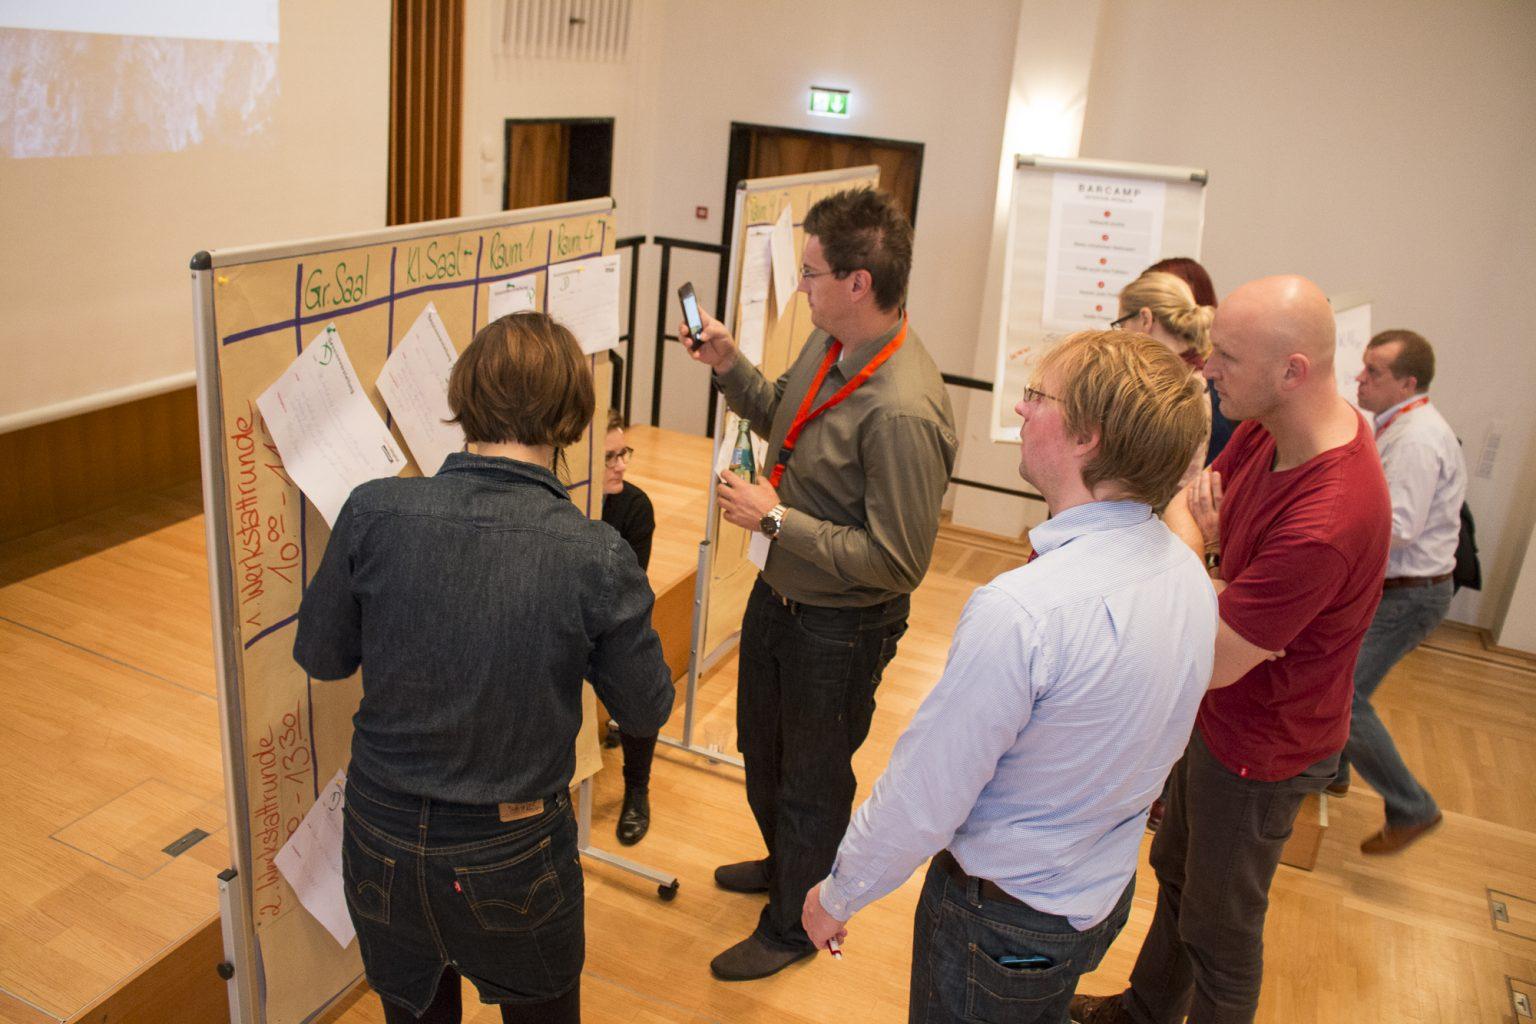 Barcamp-Planung bei der Digital-Werkstatt